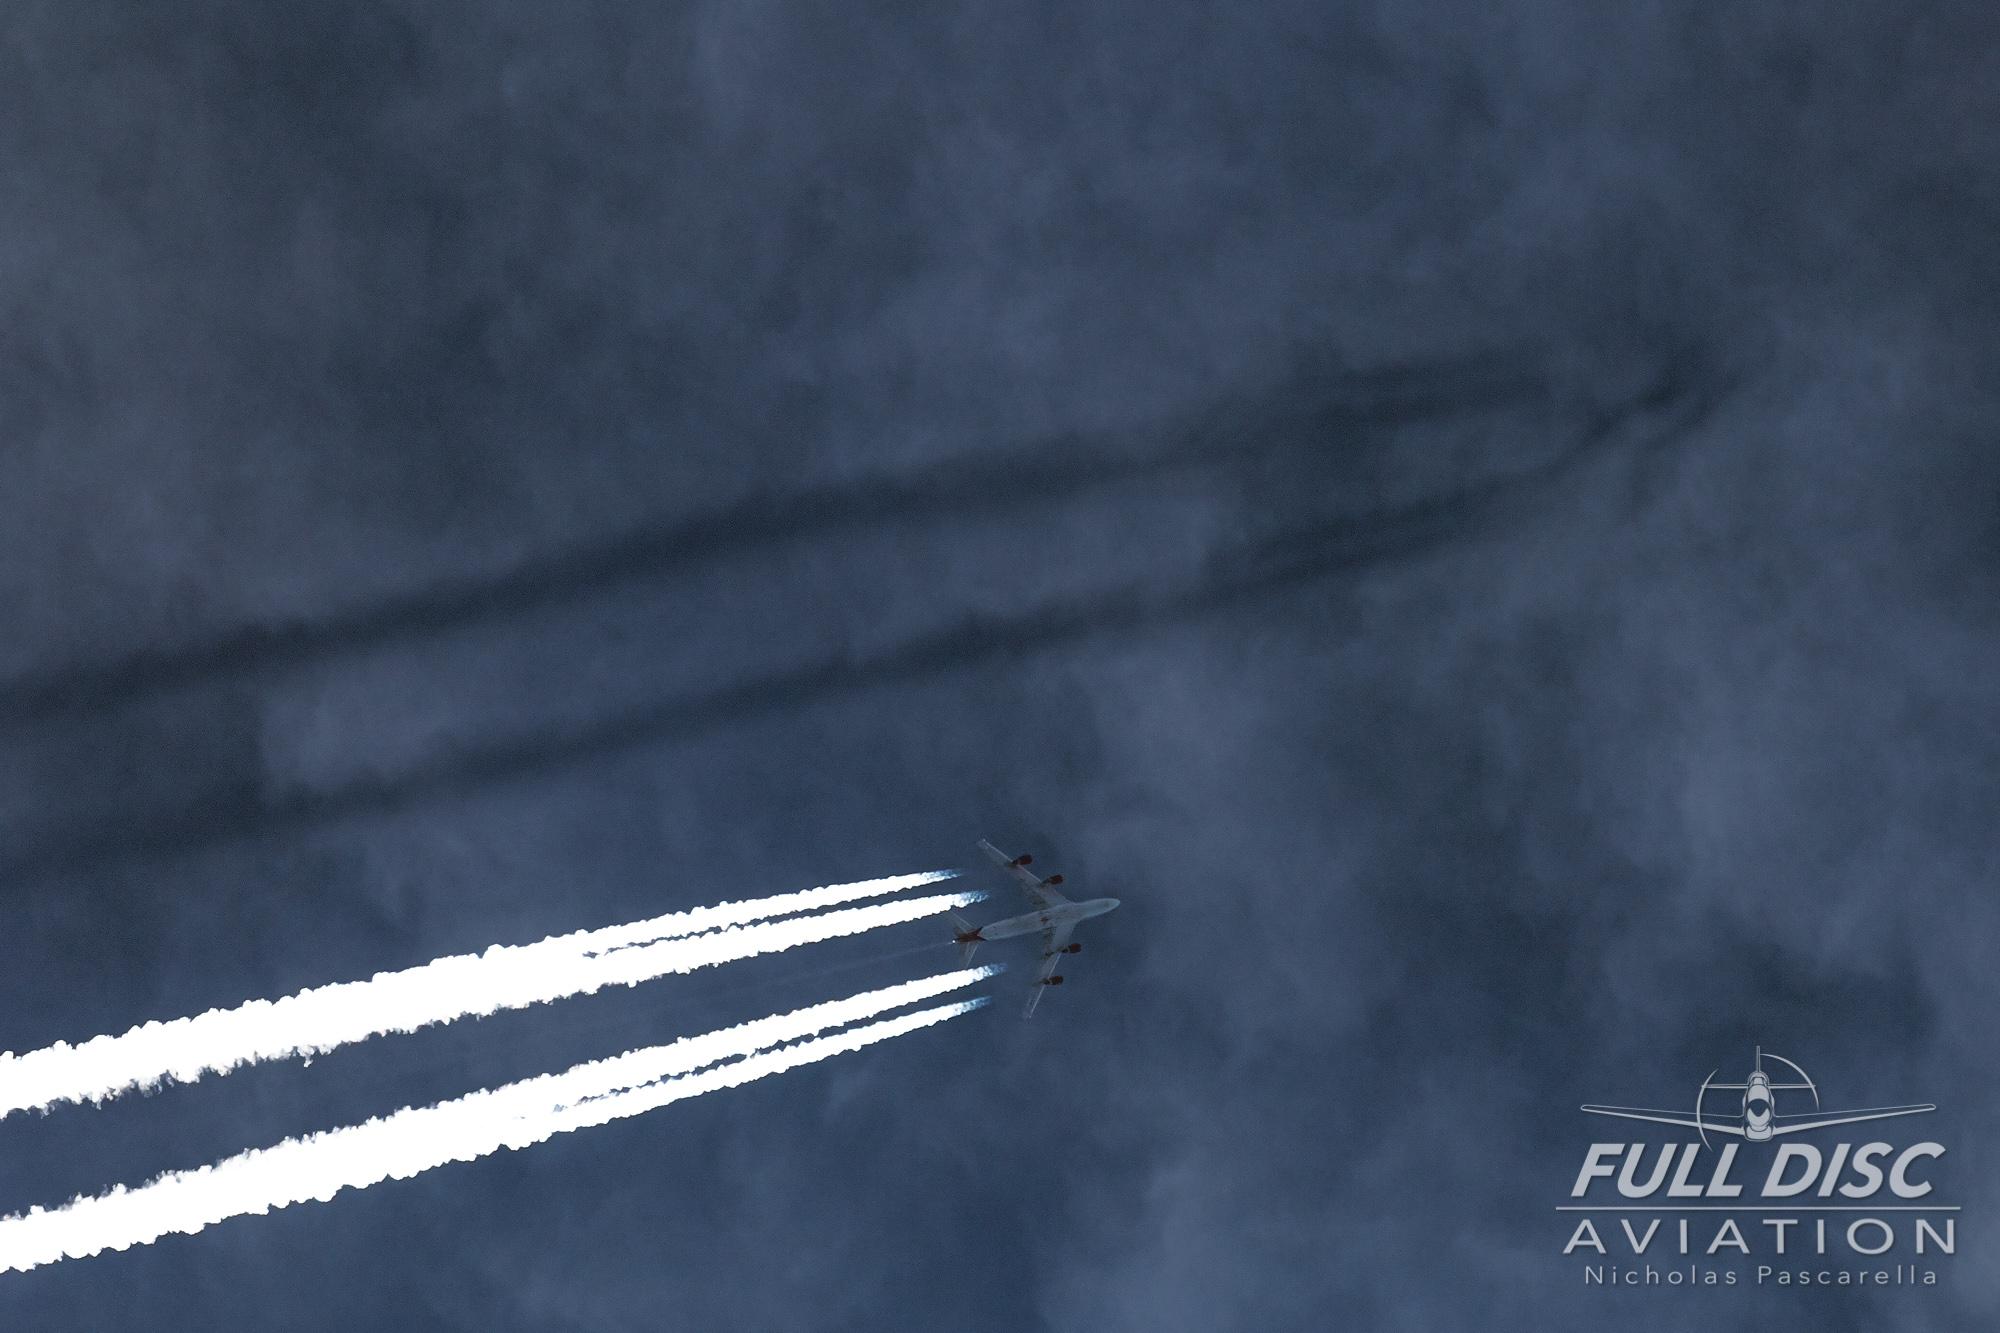 nickpascarella_fulldiscaviation_oceancityairshow_aviation_airliner.jpg